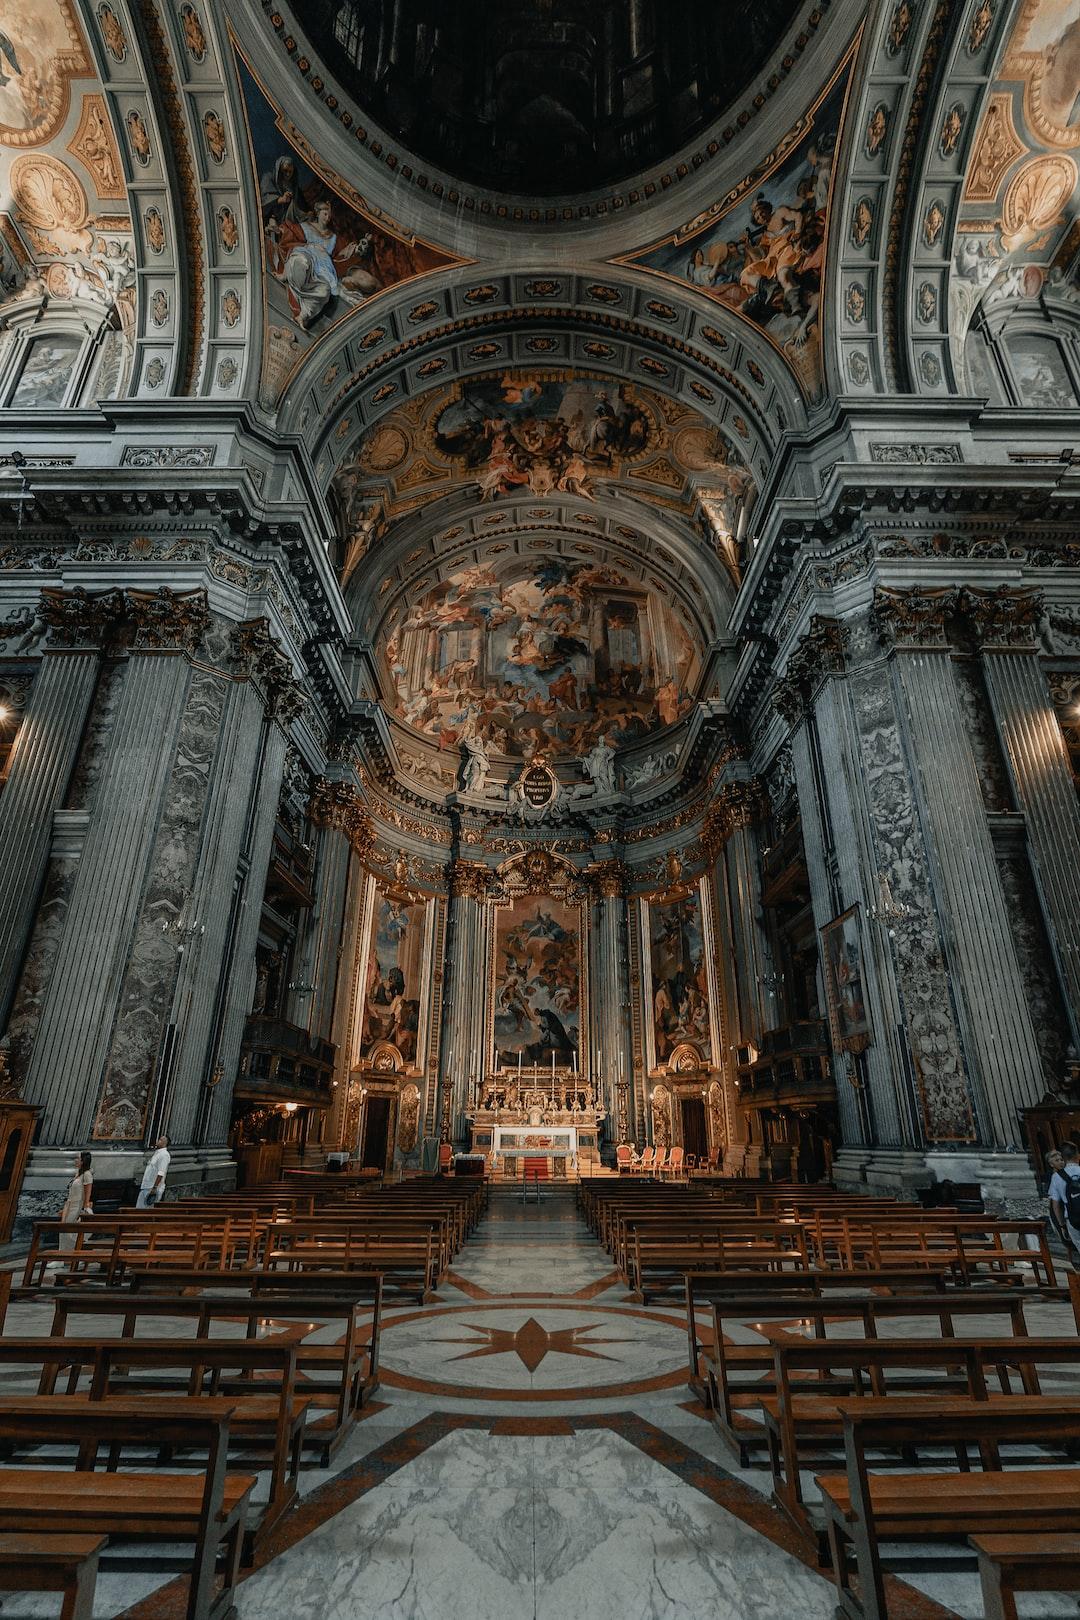 The Church of St. Ignatius of Loyola (1/2)